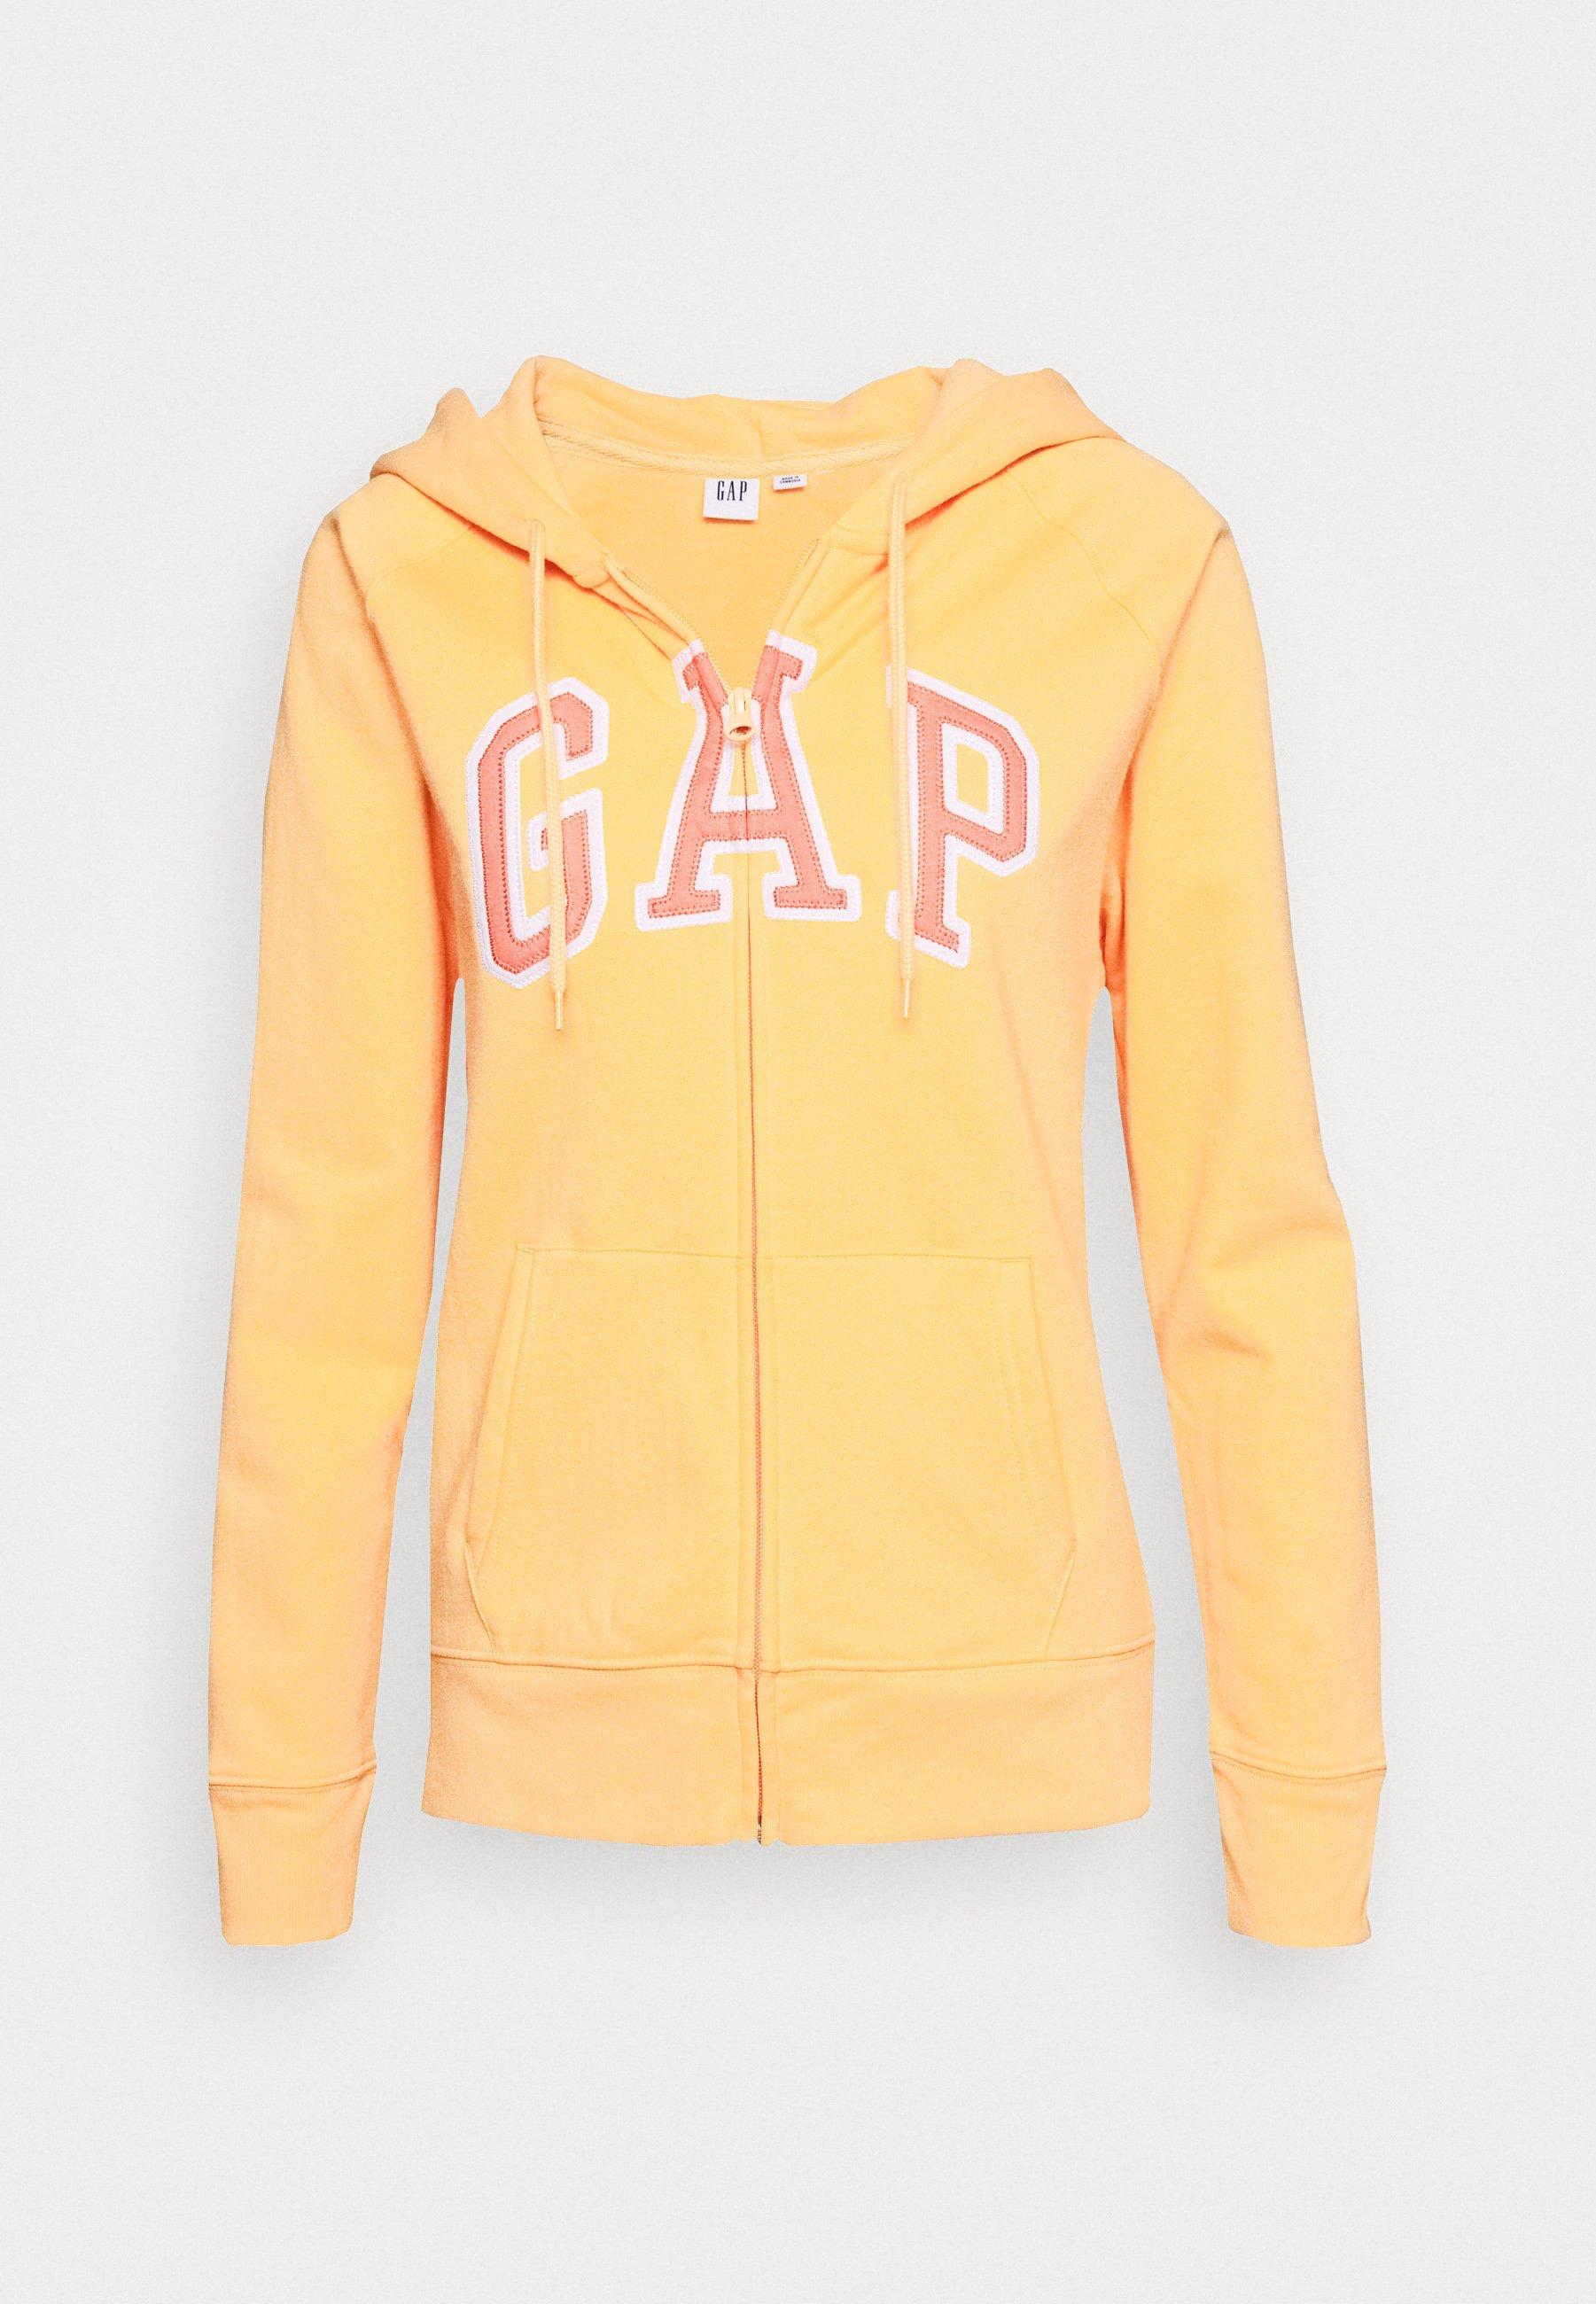 GAP FASH veste en sweat zippée icy orange ZALANDO.FR